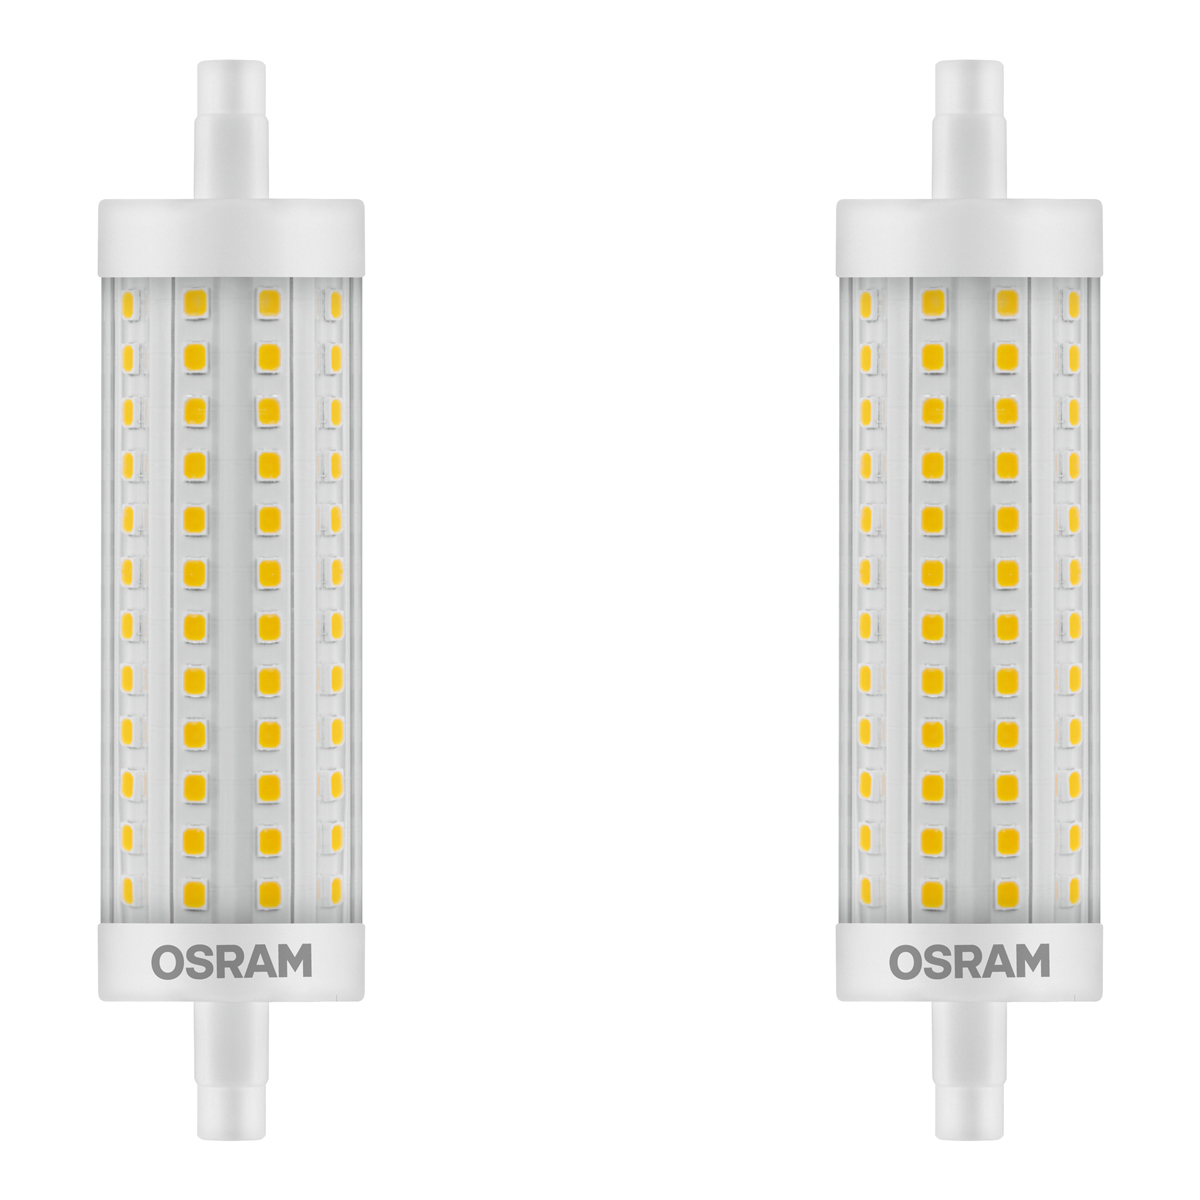 Bellalux LED-Röhre R7s Stablampe klar 12,5W=100W 1521 lm Stabform